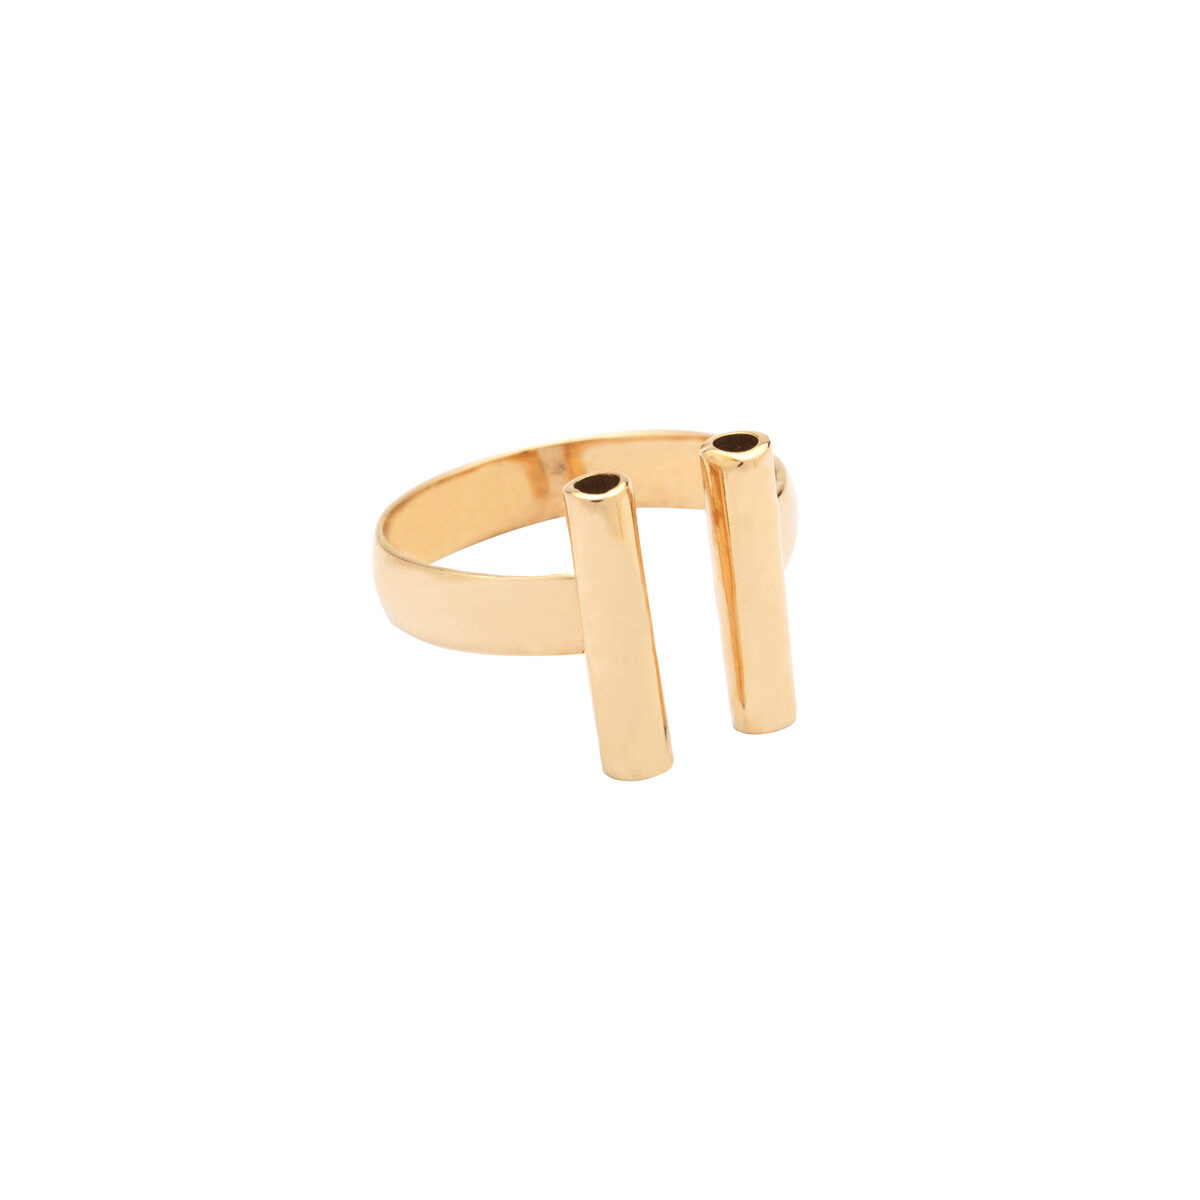 انگشتر طلا دو استوانه 2